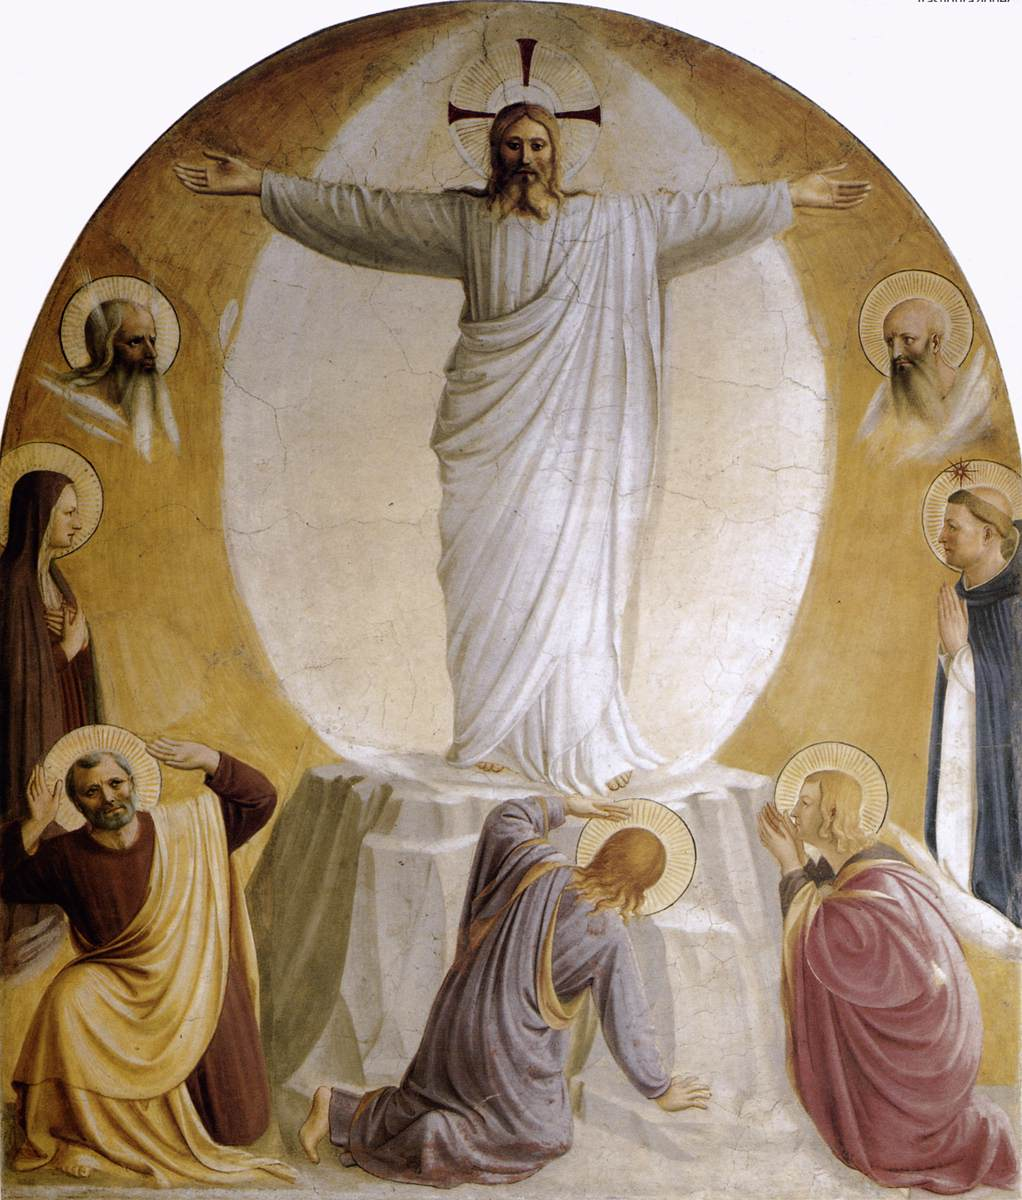 Fra Angelico, Transfiguration